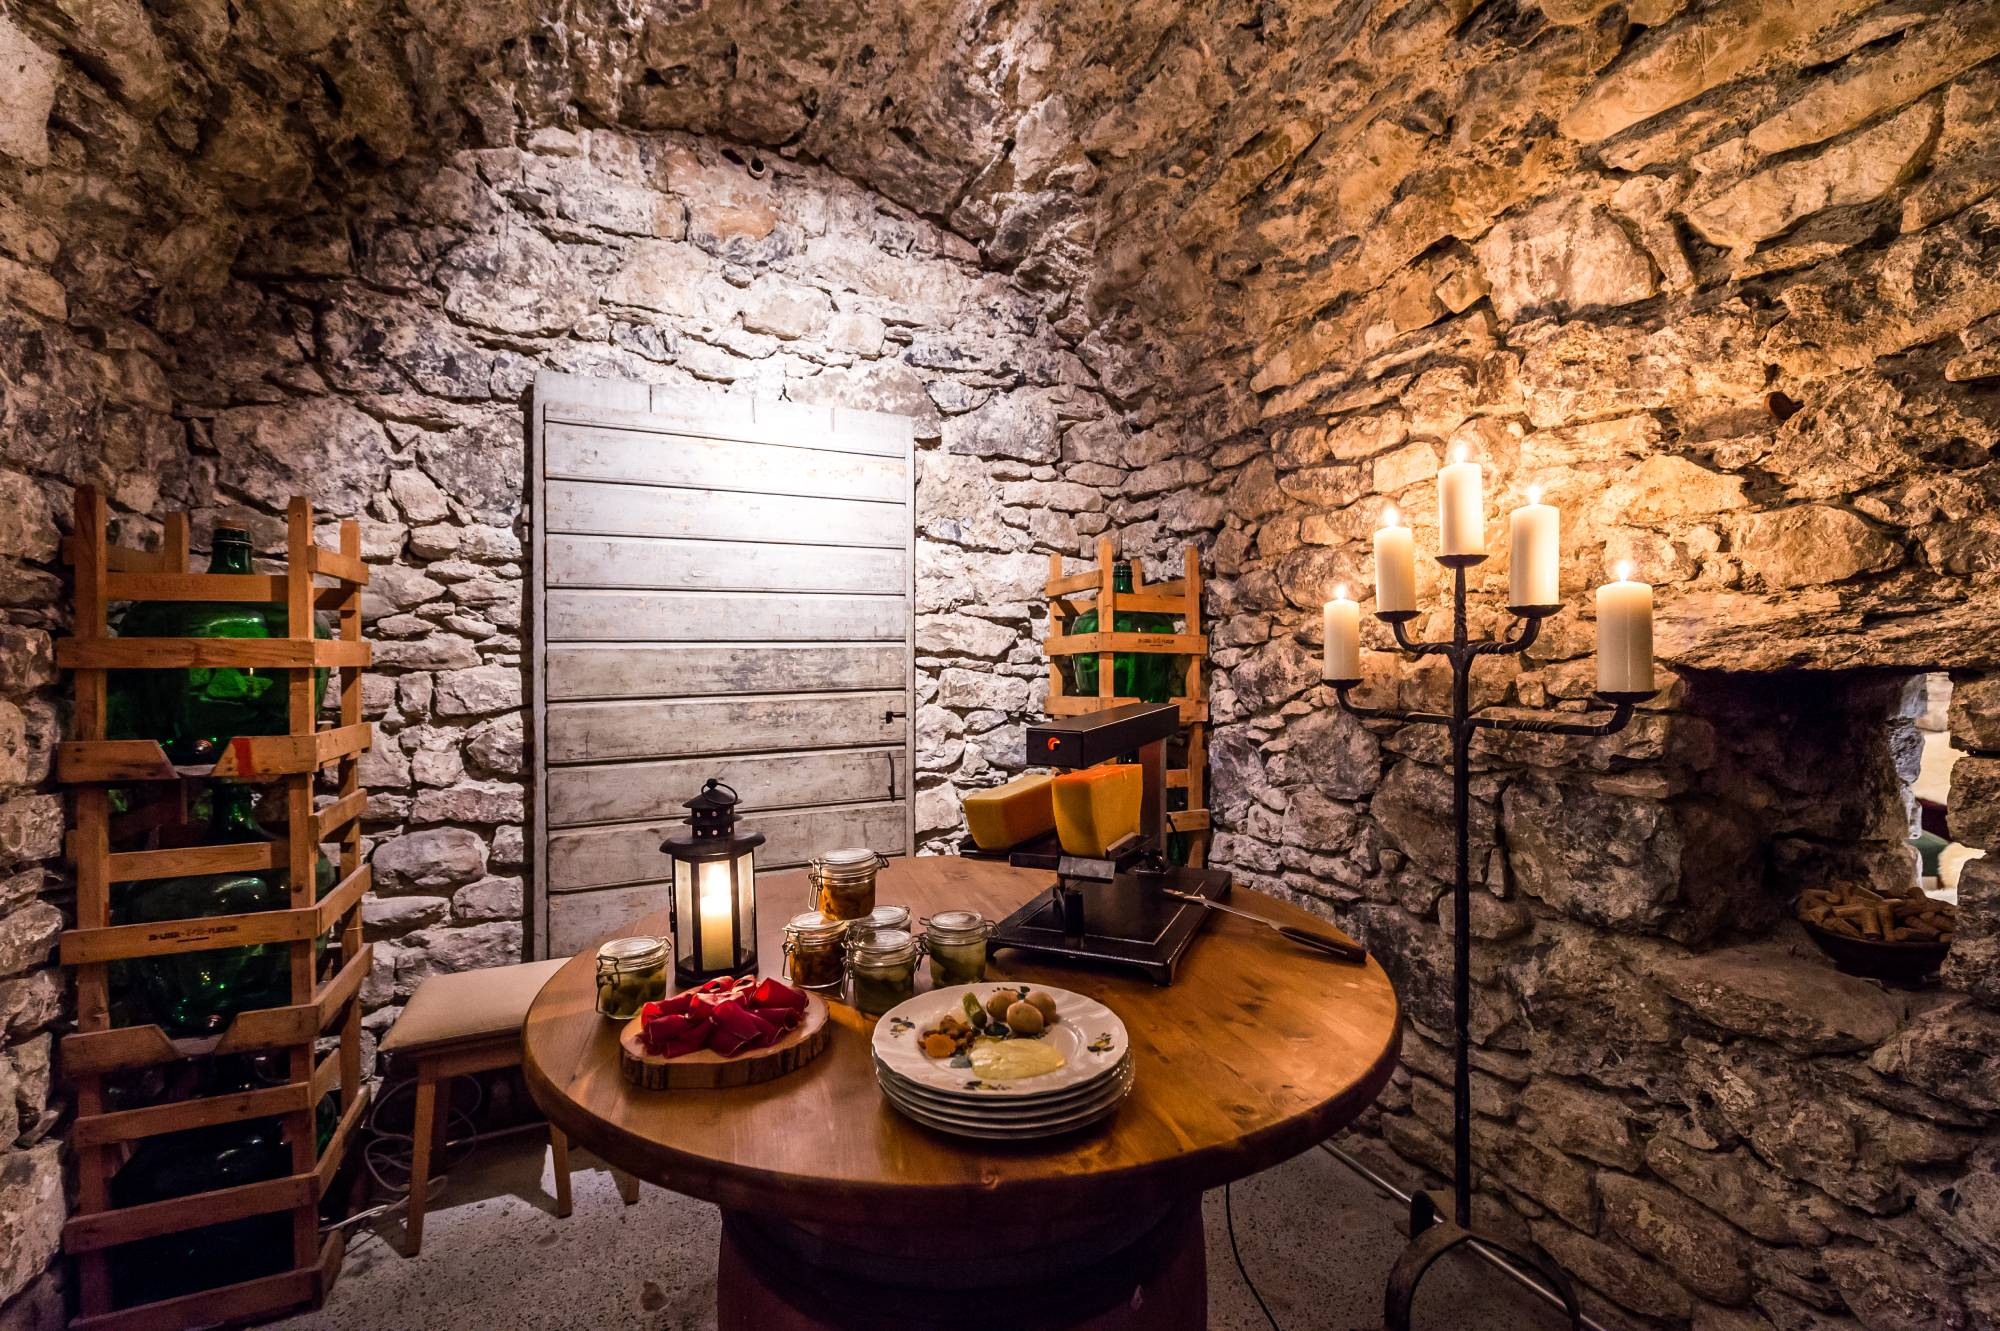 Galerie photo du caveau de l'Auberge du Raisin à Cully